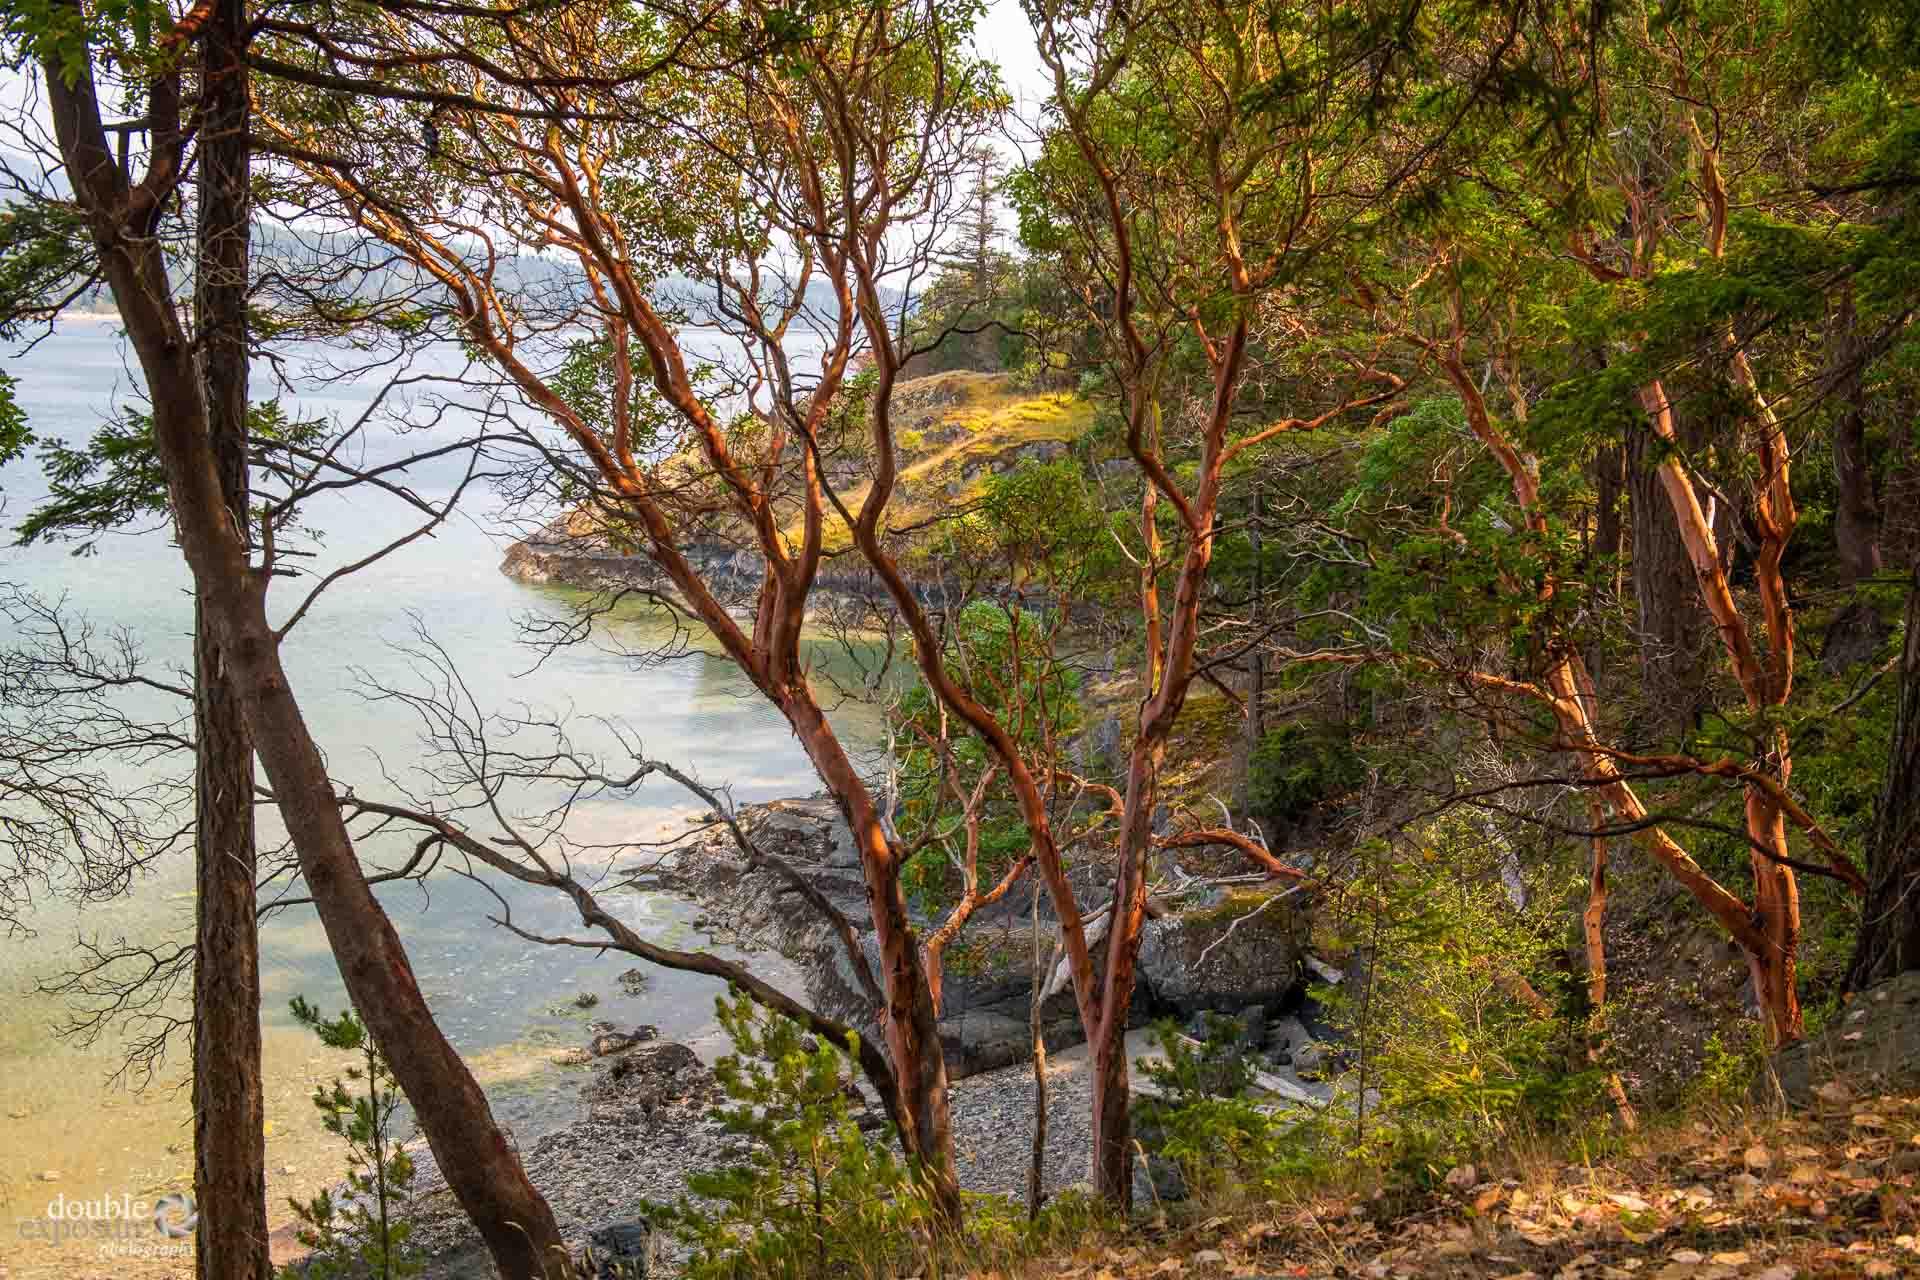 Arbutus trees are plentiful on Texada Island